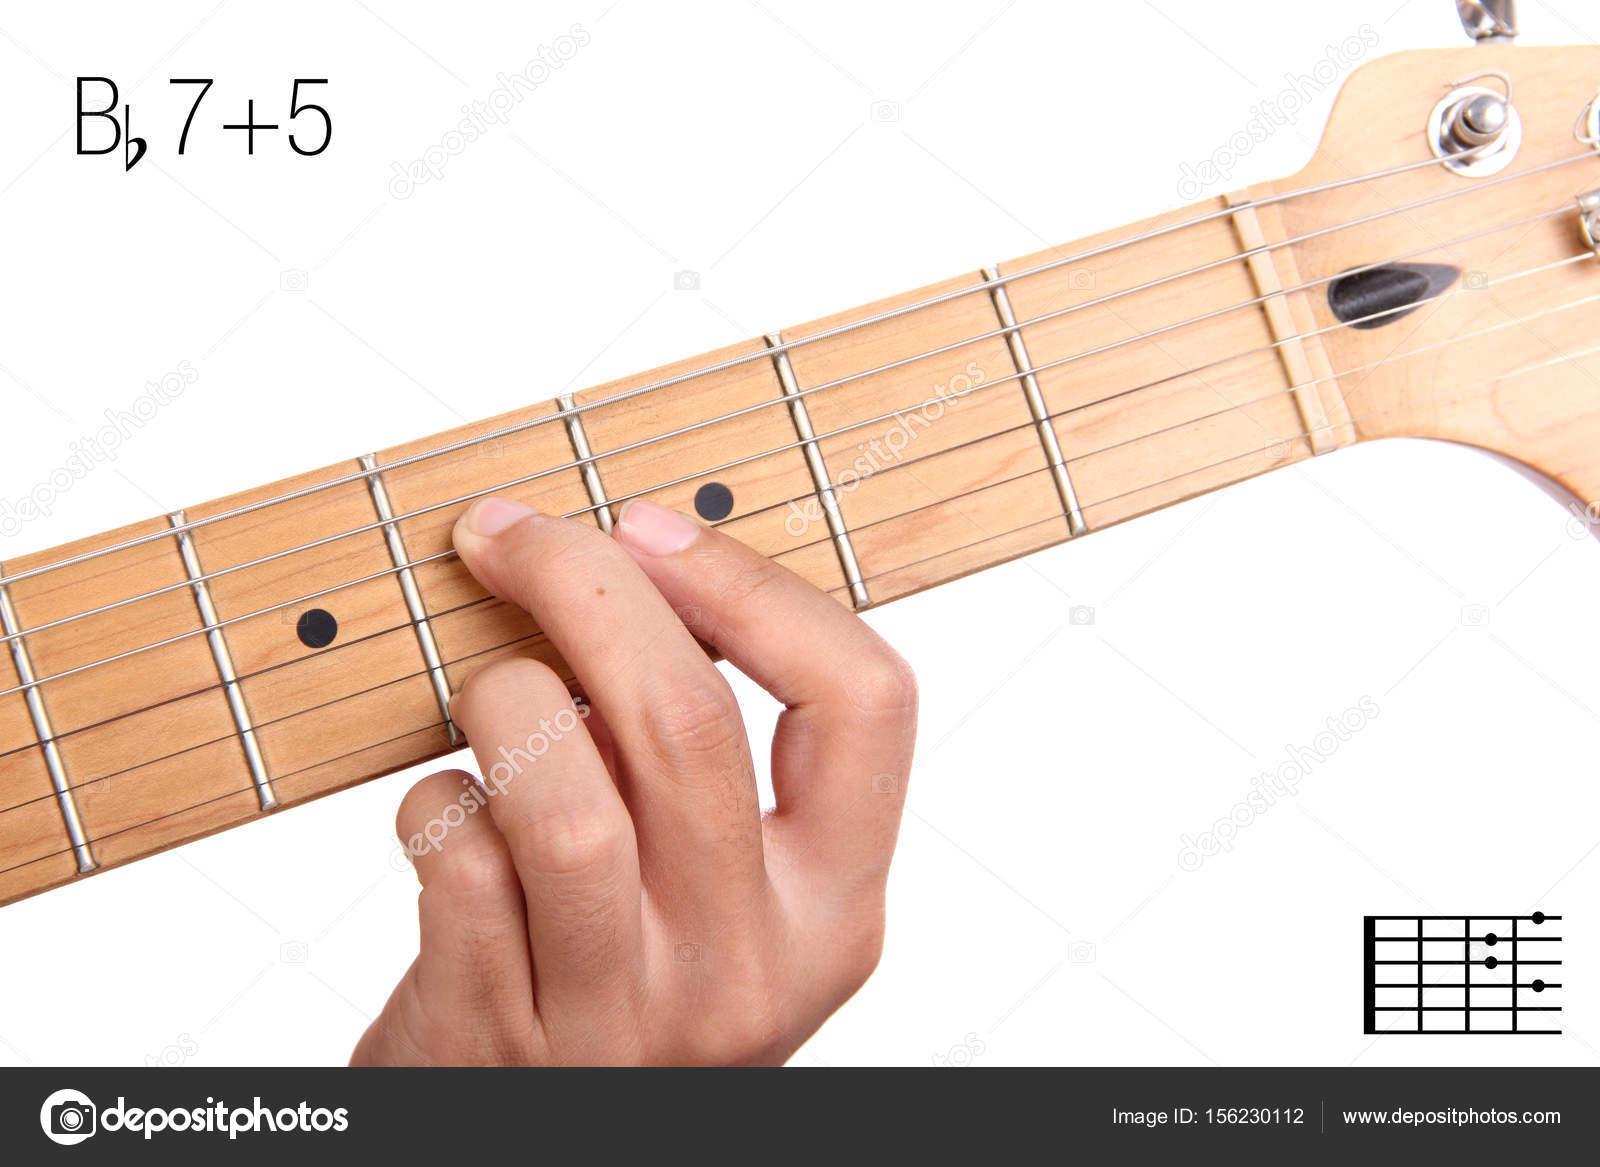 Bb75 Guitar Chord Tutorial Stock Photo Pepscostudio 156230112